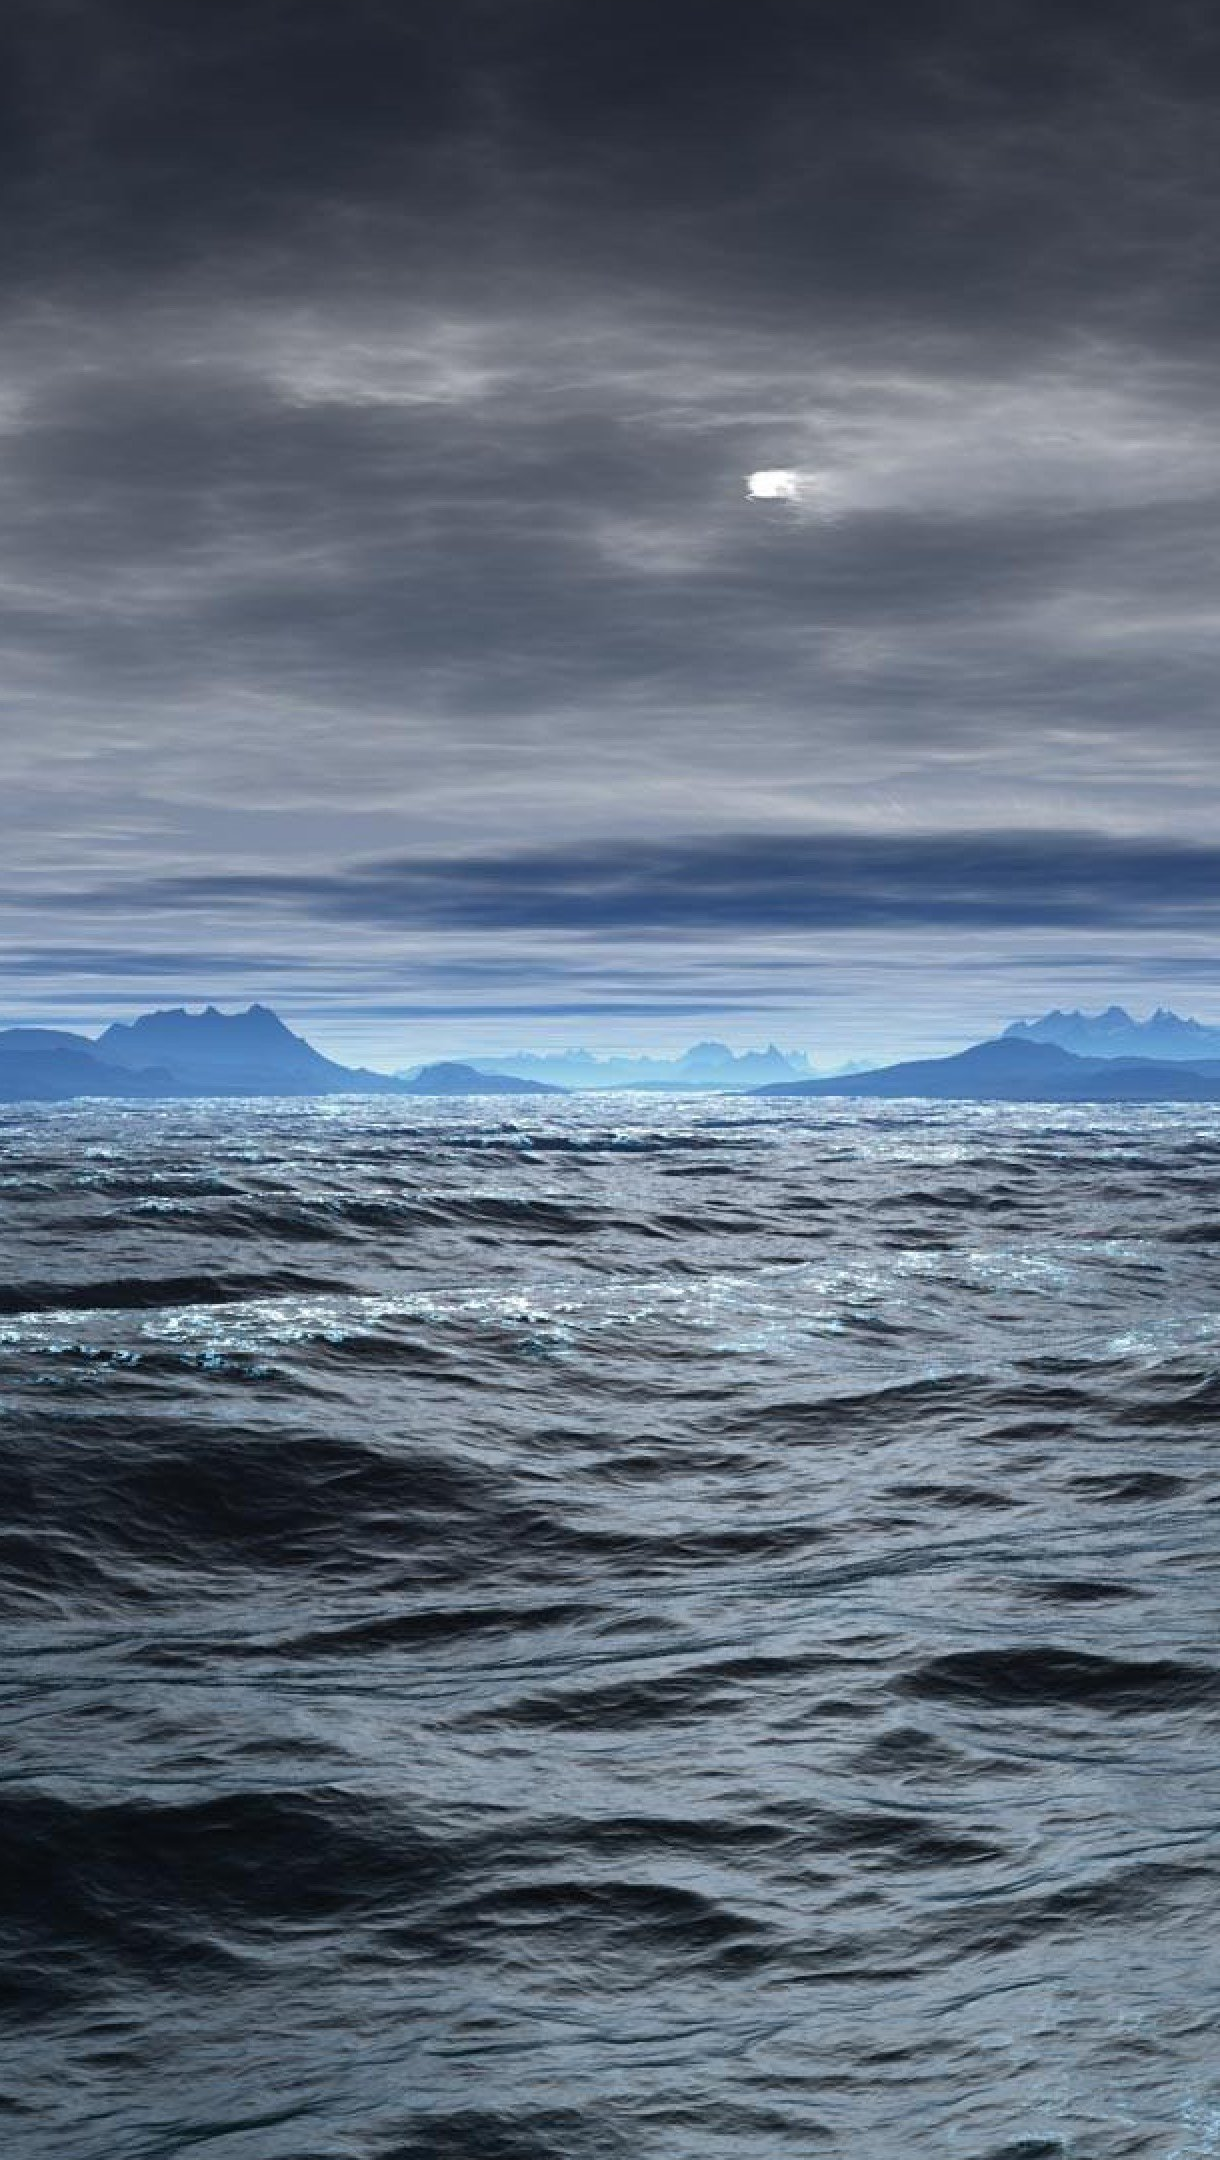 Wallpaper Ocean with storm clouds Vertical